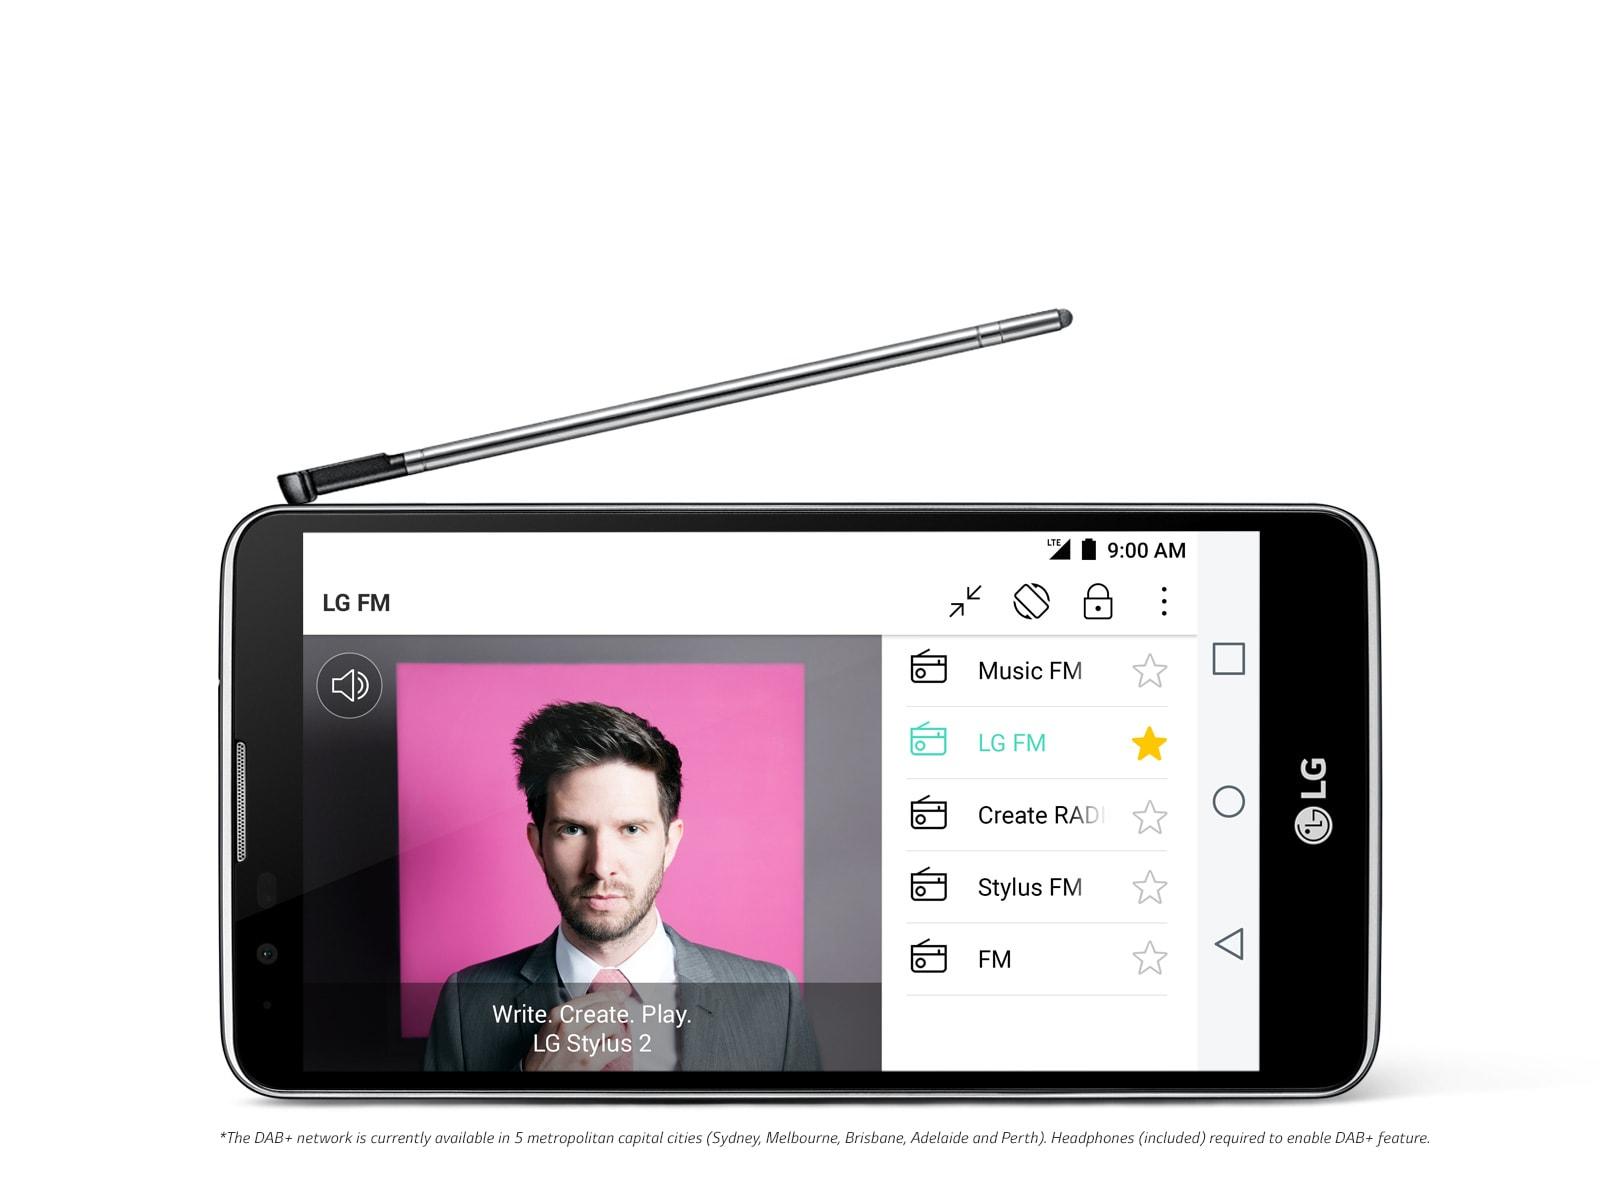 lg stylus dab smartphone lgk520k lg australia. Black Bedroom Furniture Sets. Home Design Ideas